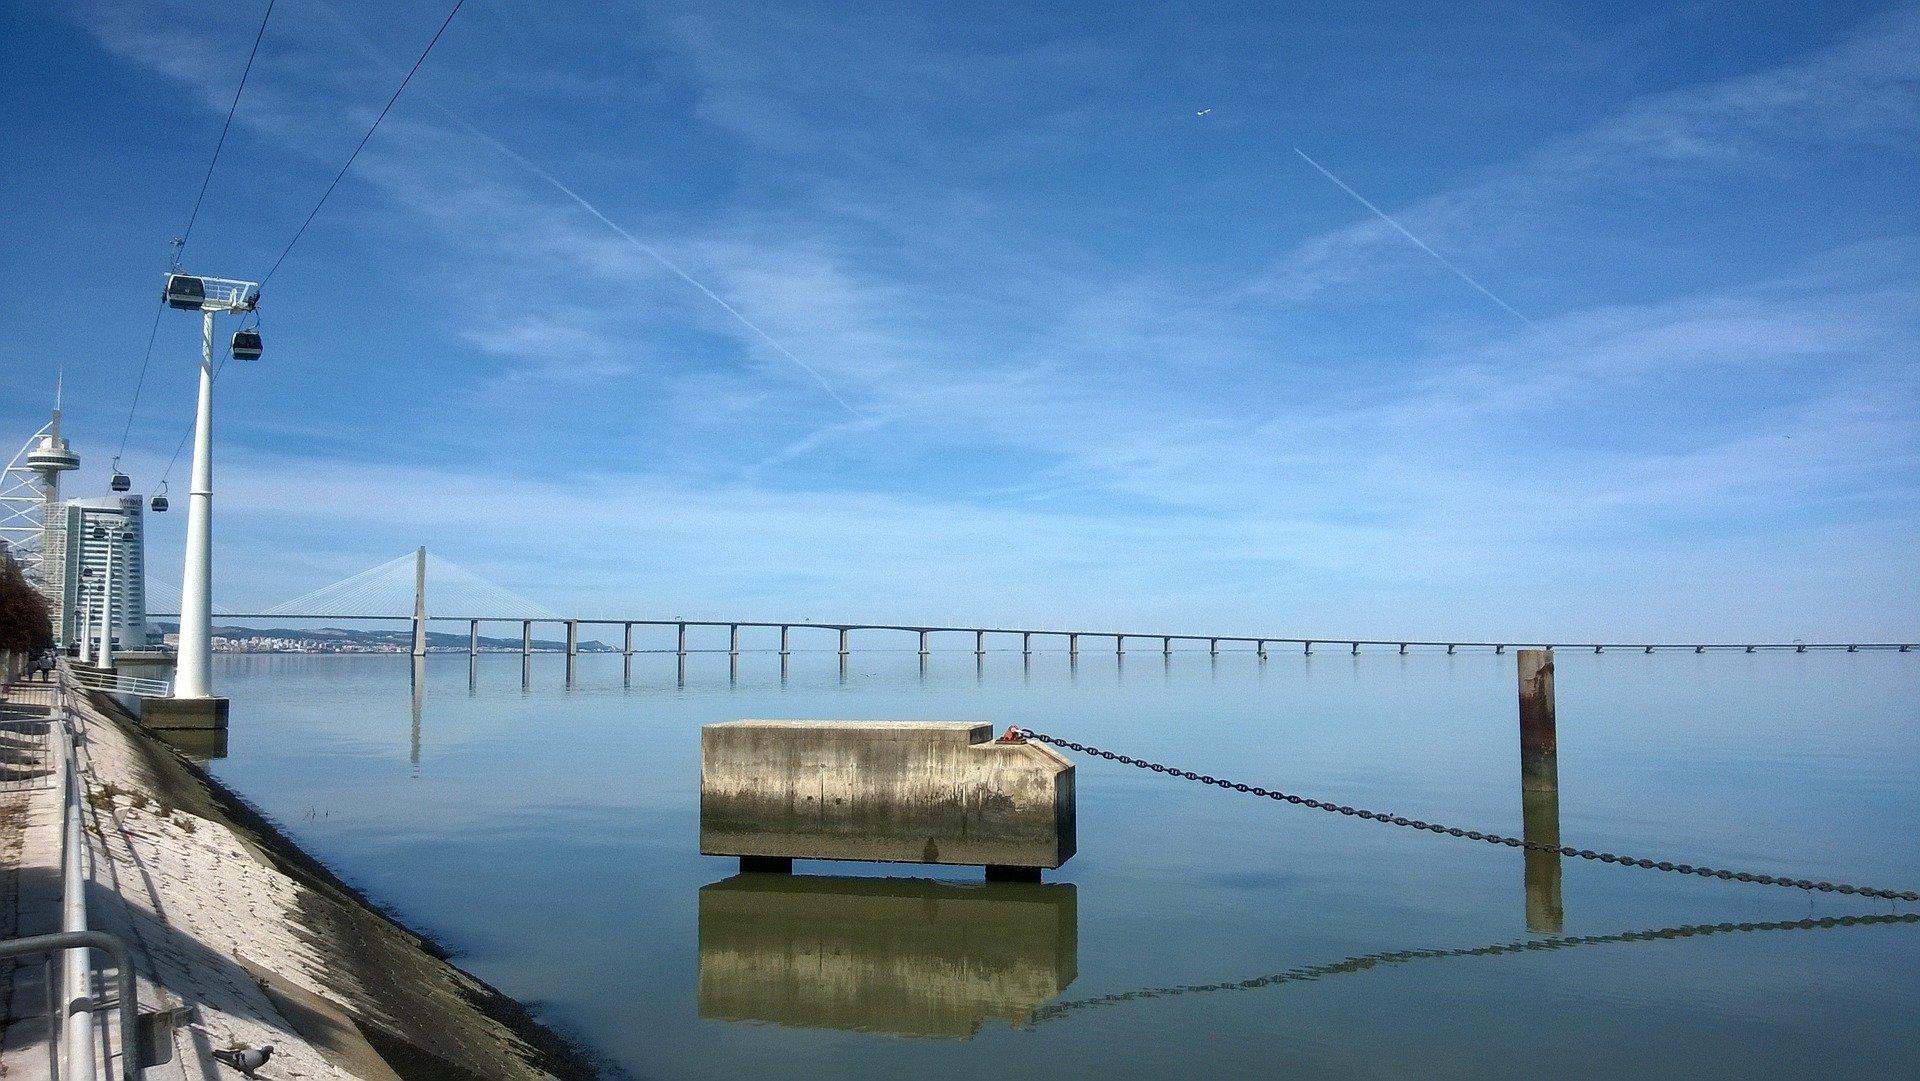 где находится мост васко да гама